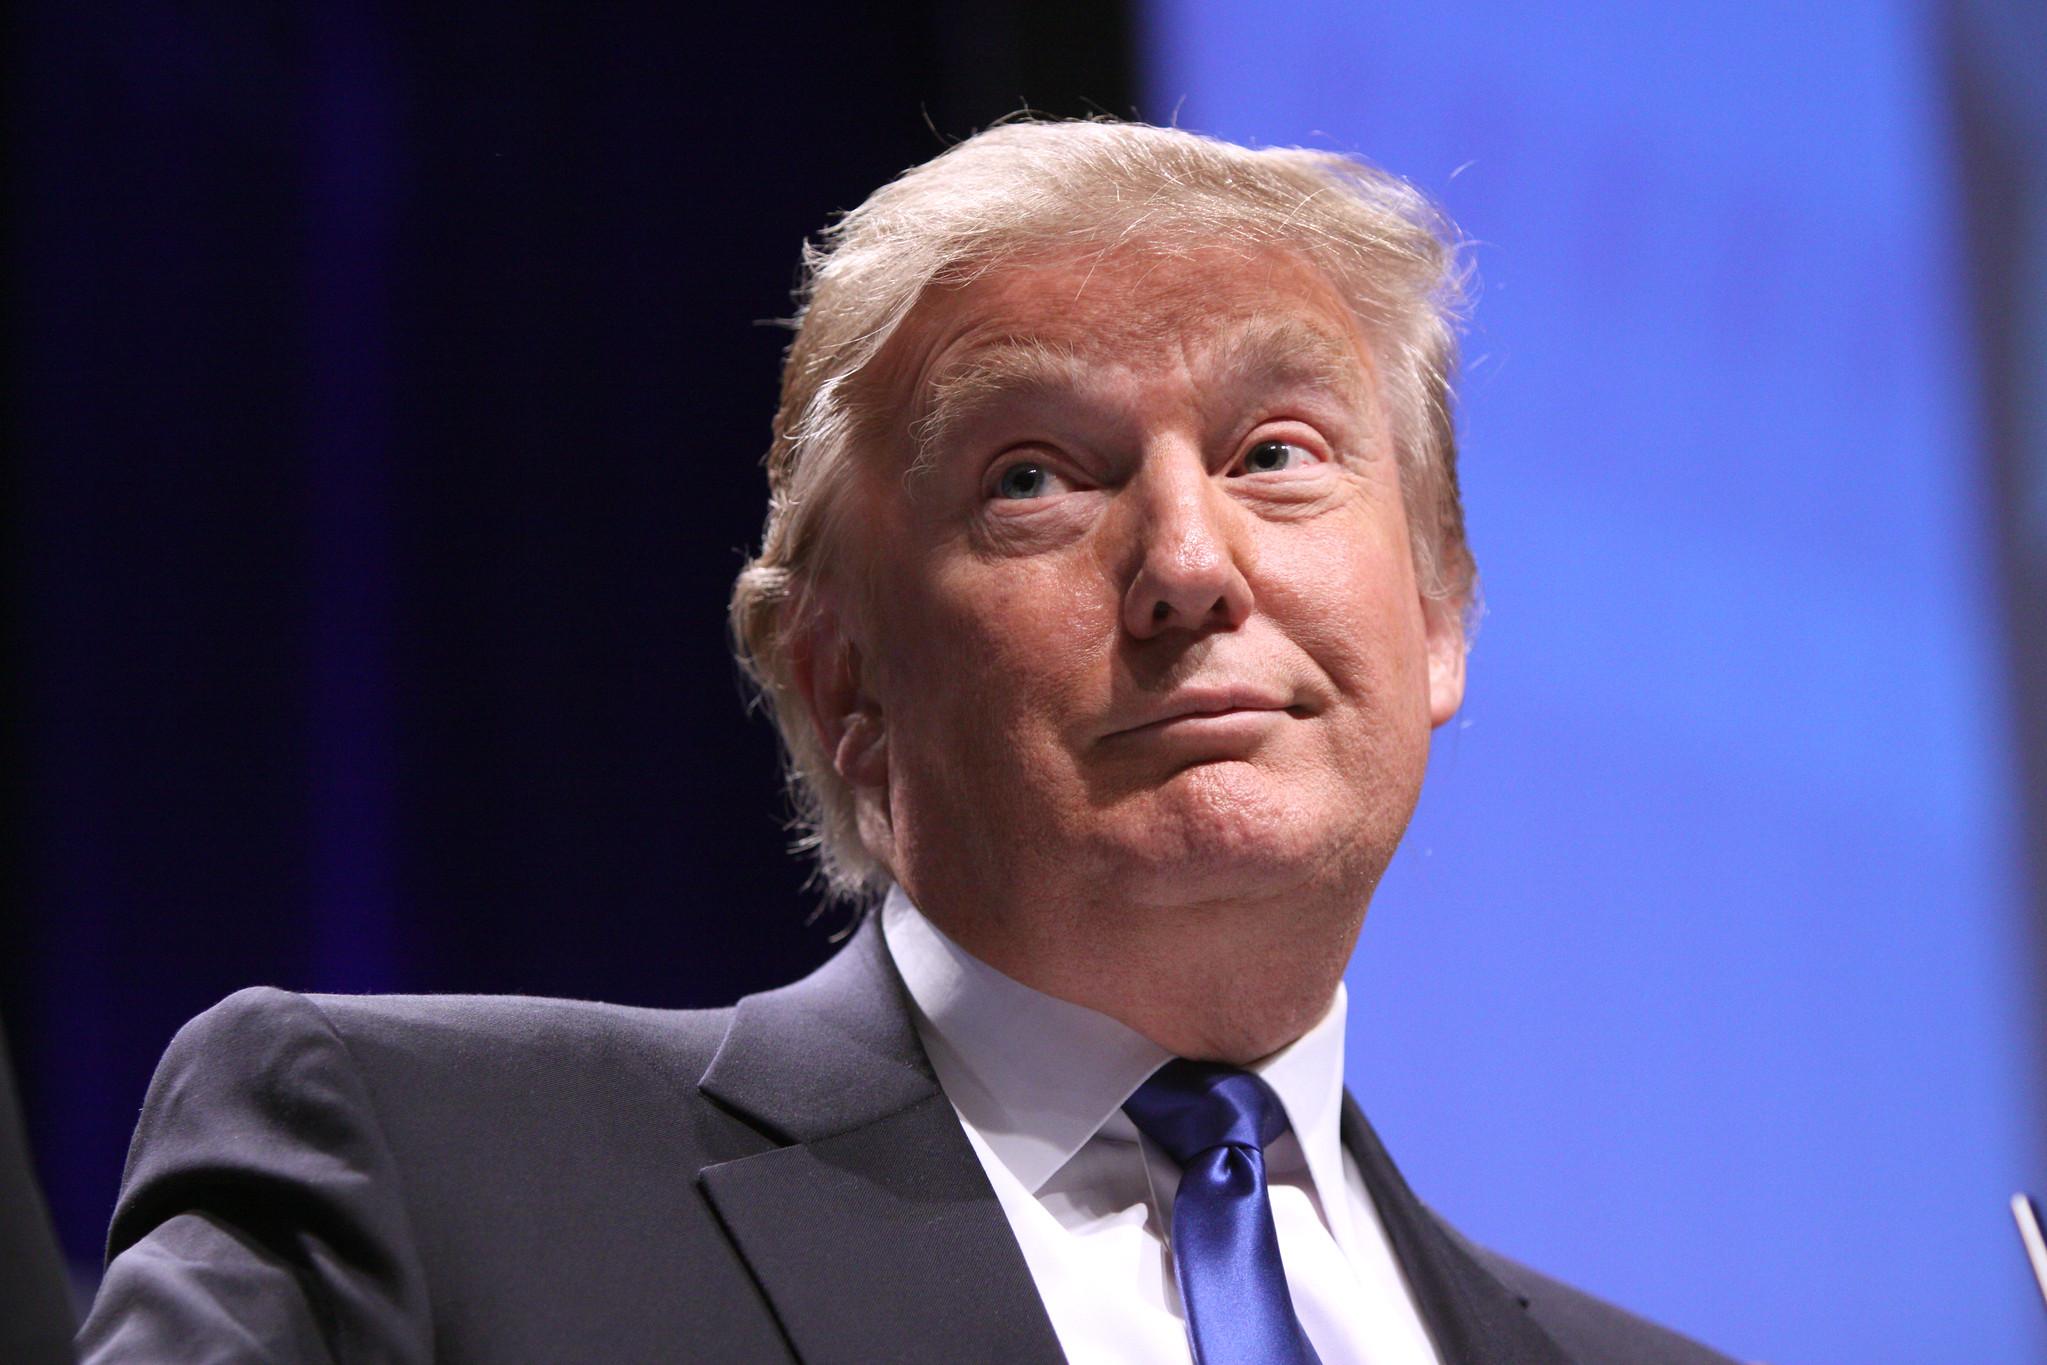 Donld Trump